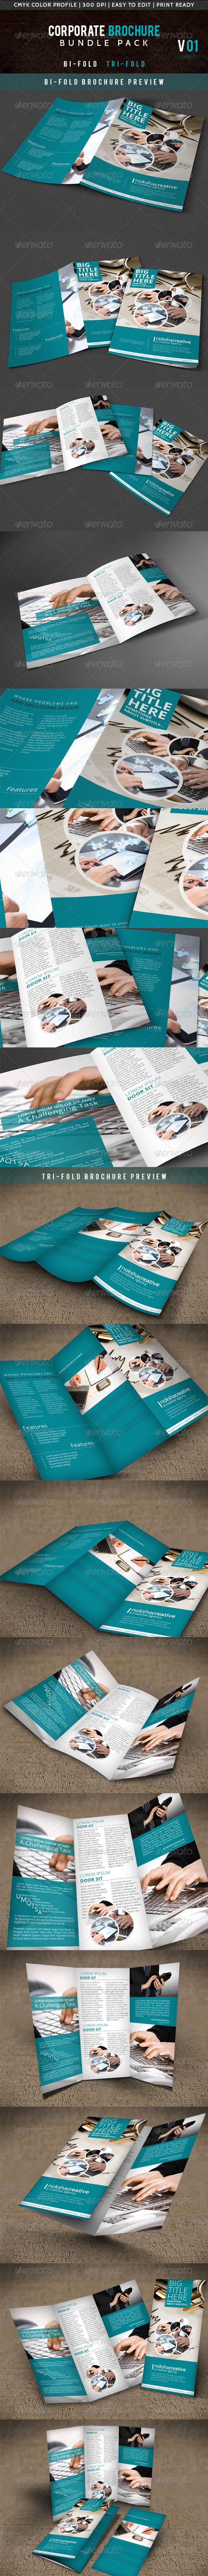 GraphicRiver Corporate Brochure Bunlde V 01 5531480